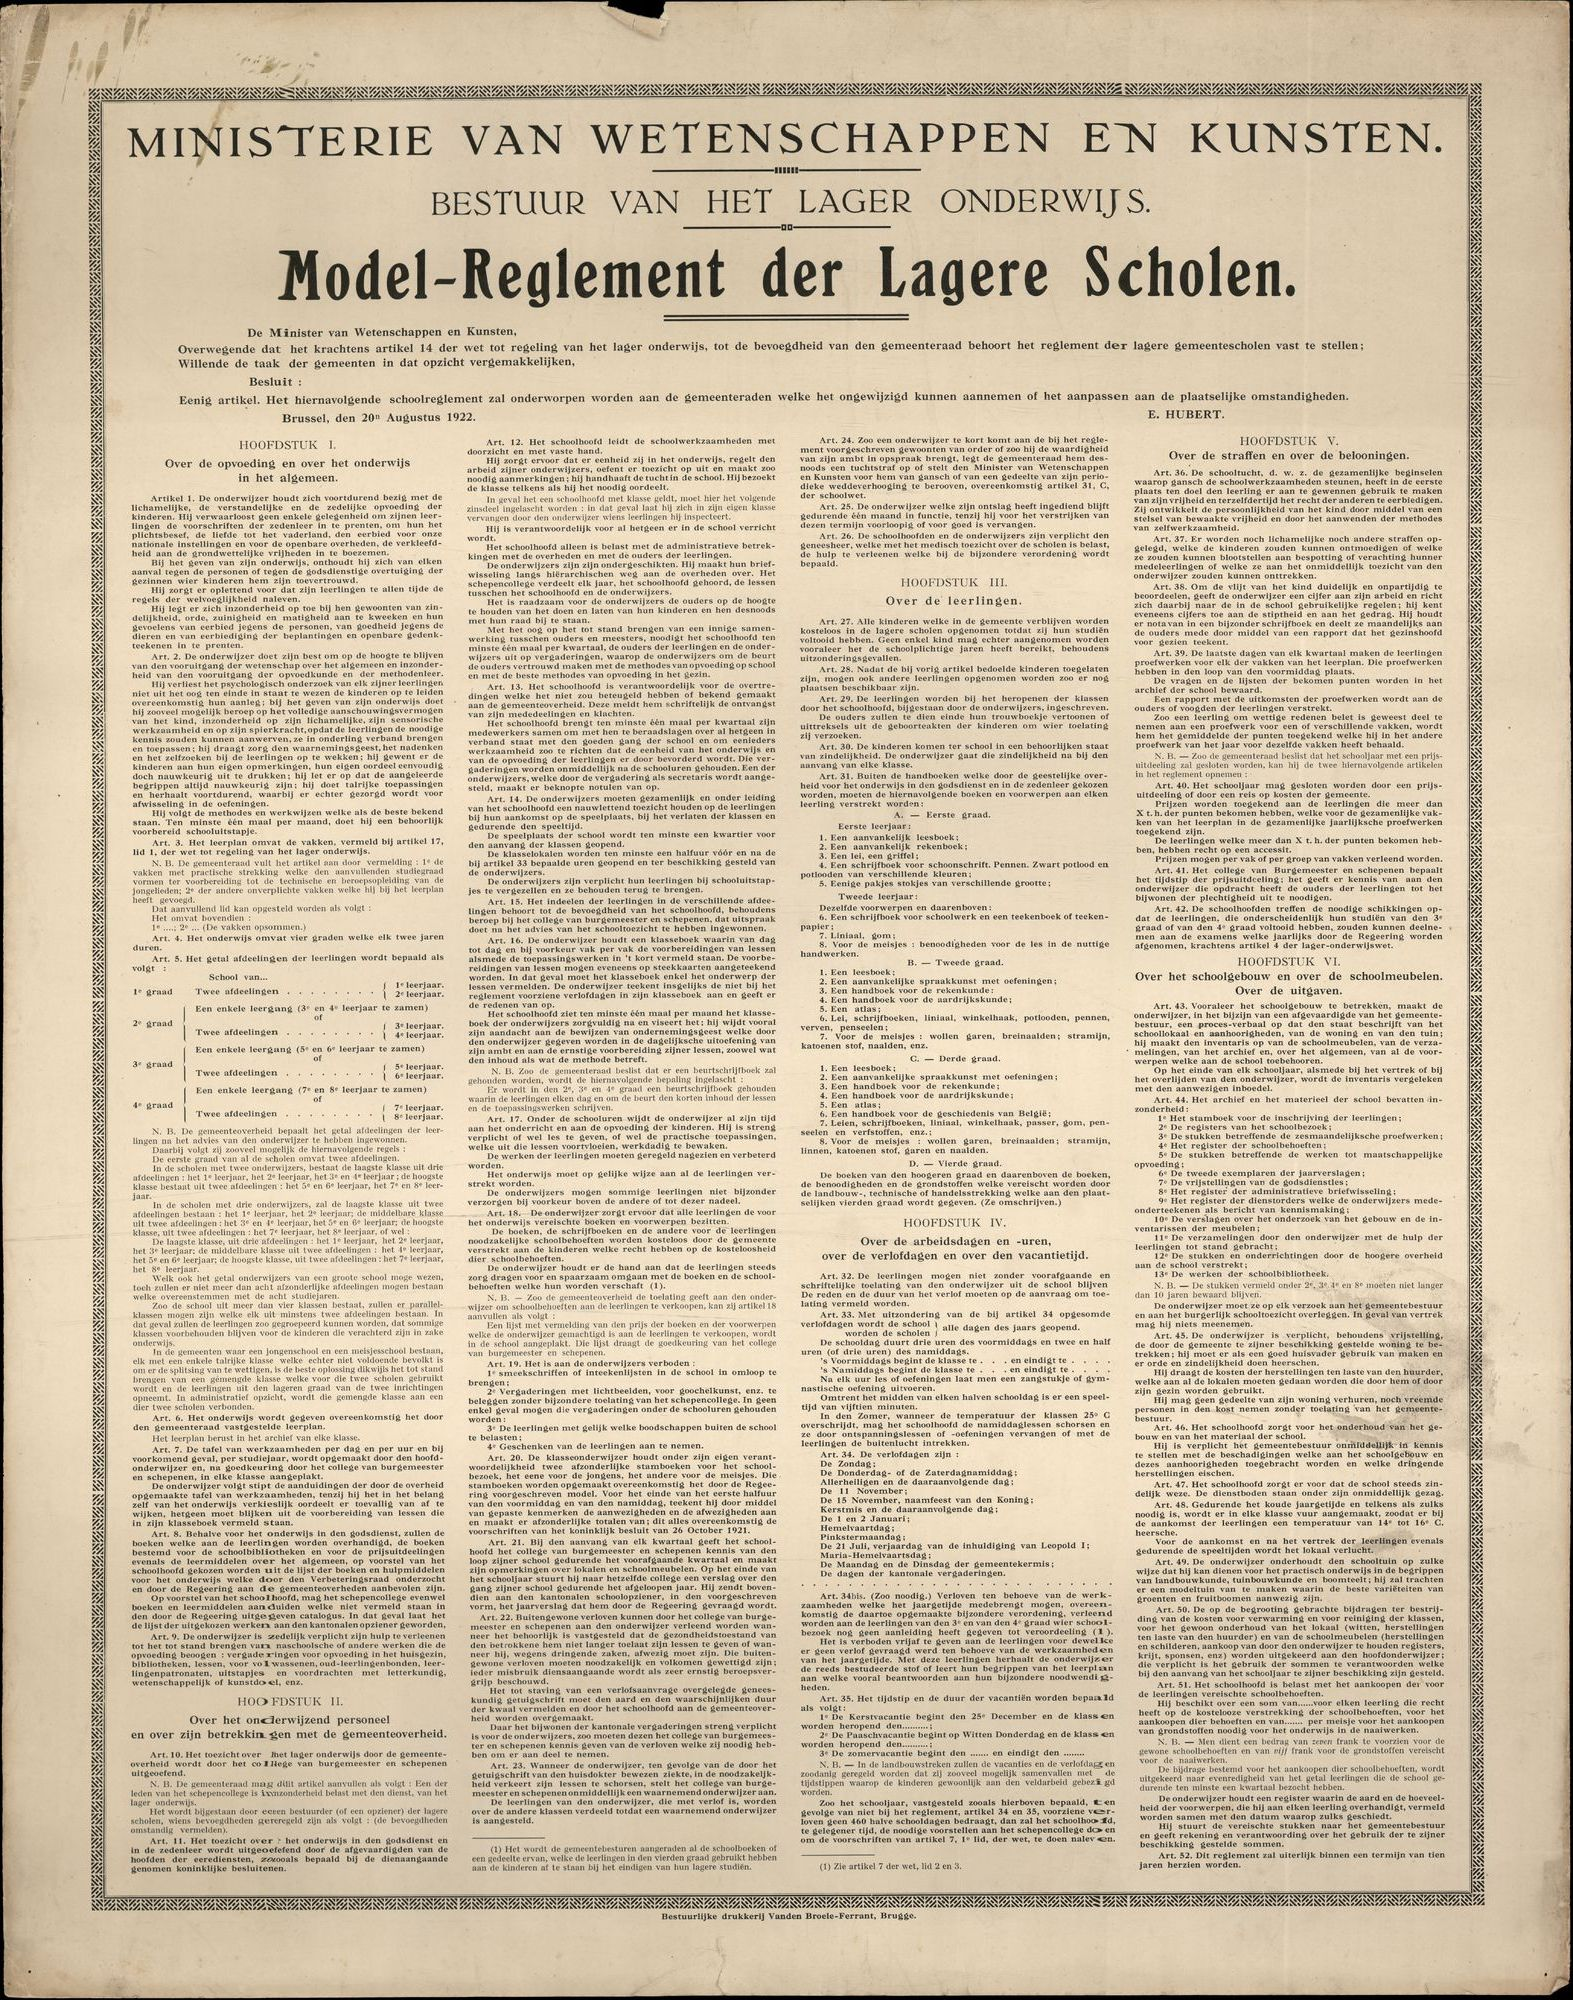 Modelreglement der lagere scholen